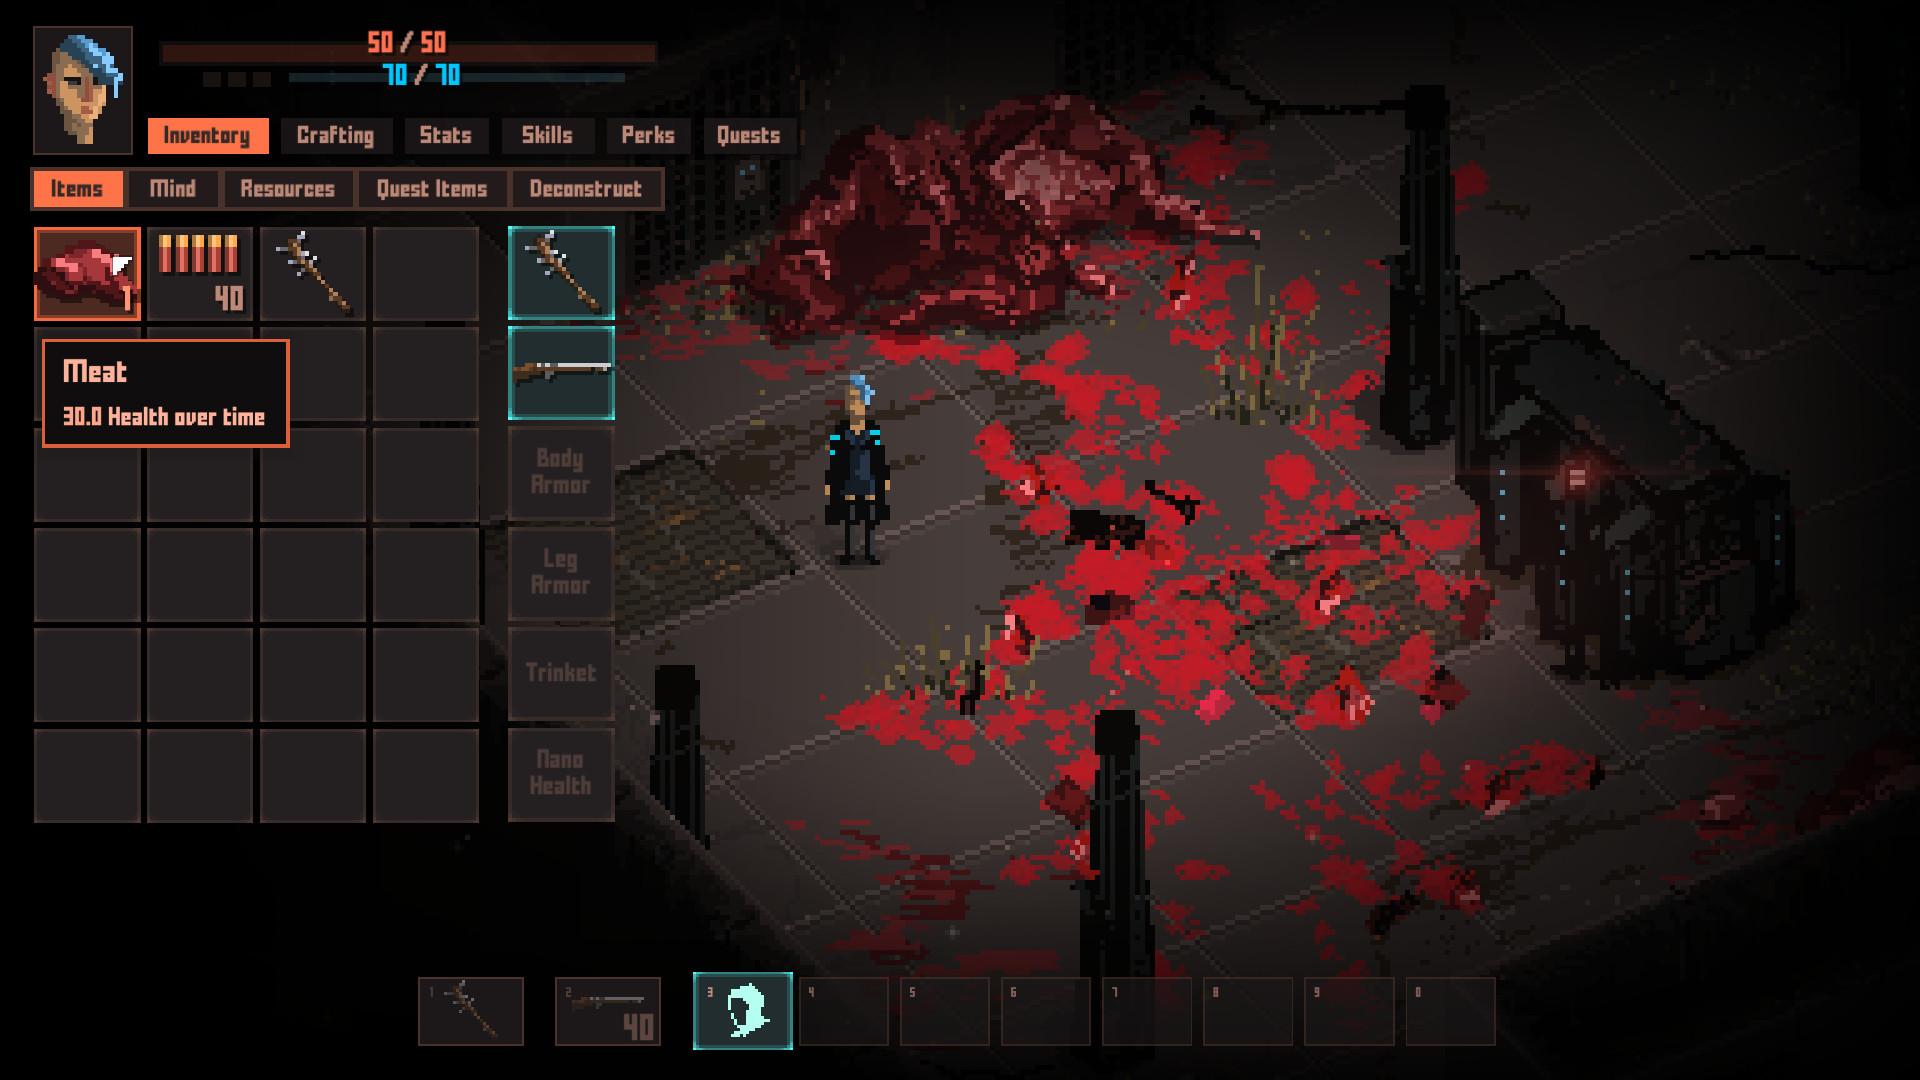 Post-Apocalyptic, Cosmic Horror RPG Death Trash Announced - RPGamer